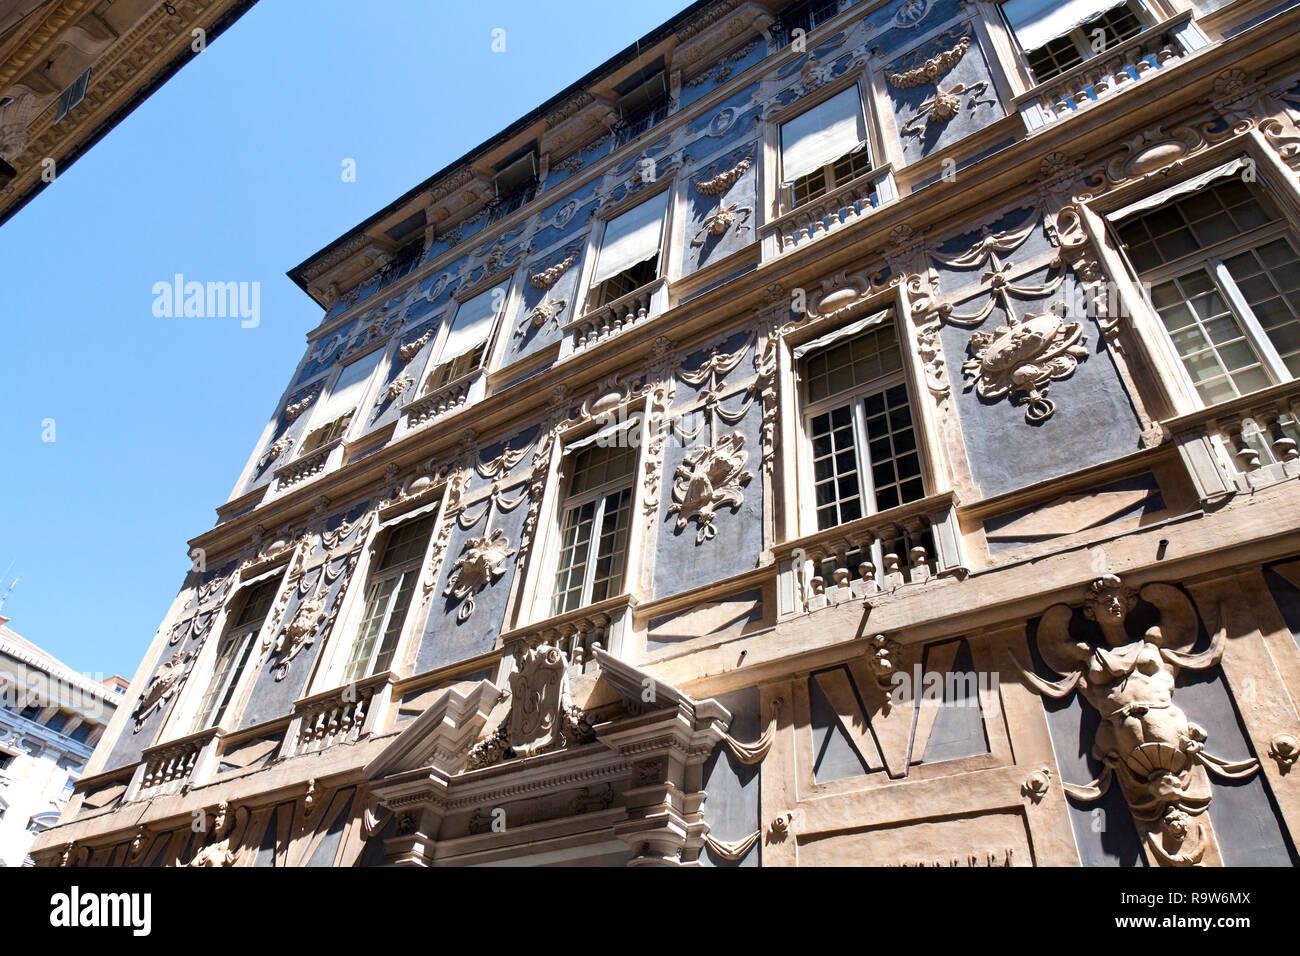 Ornate Building, Central Genoa, Italy. - Stock Image